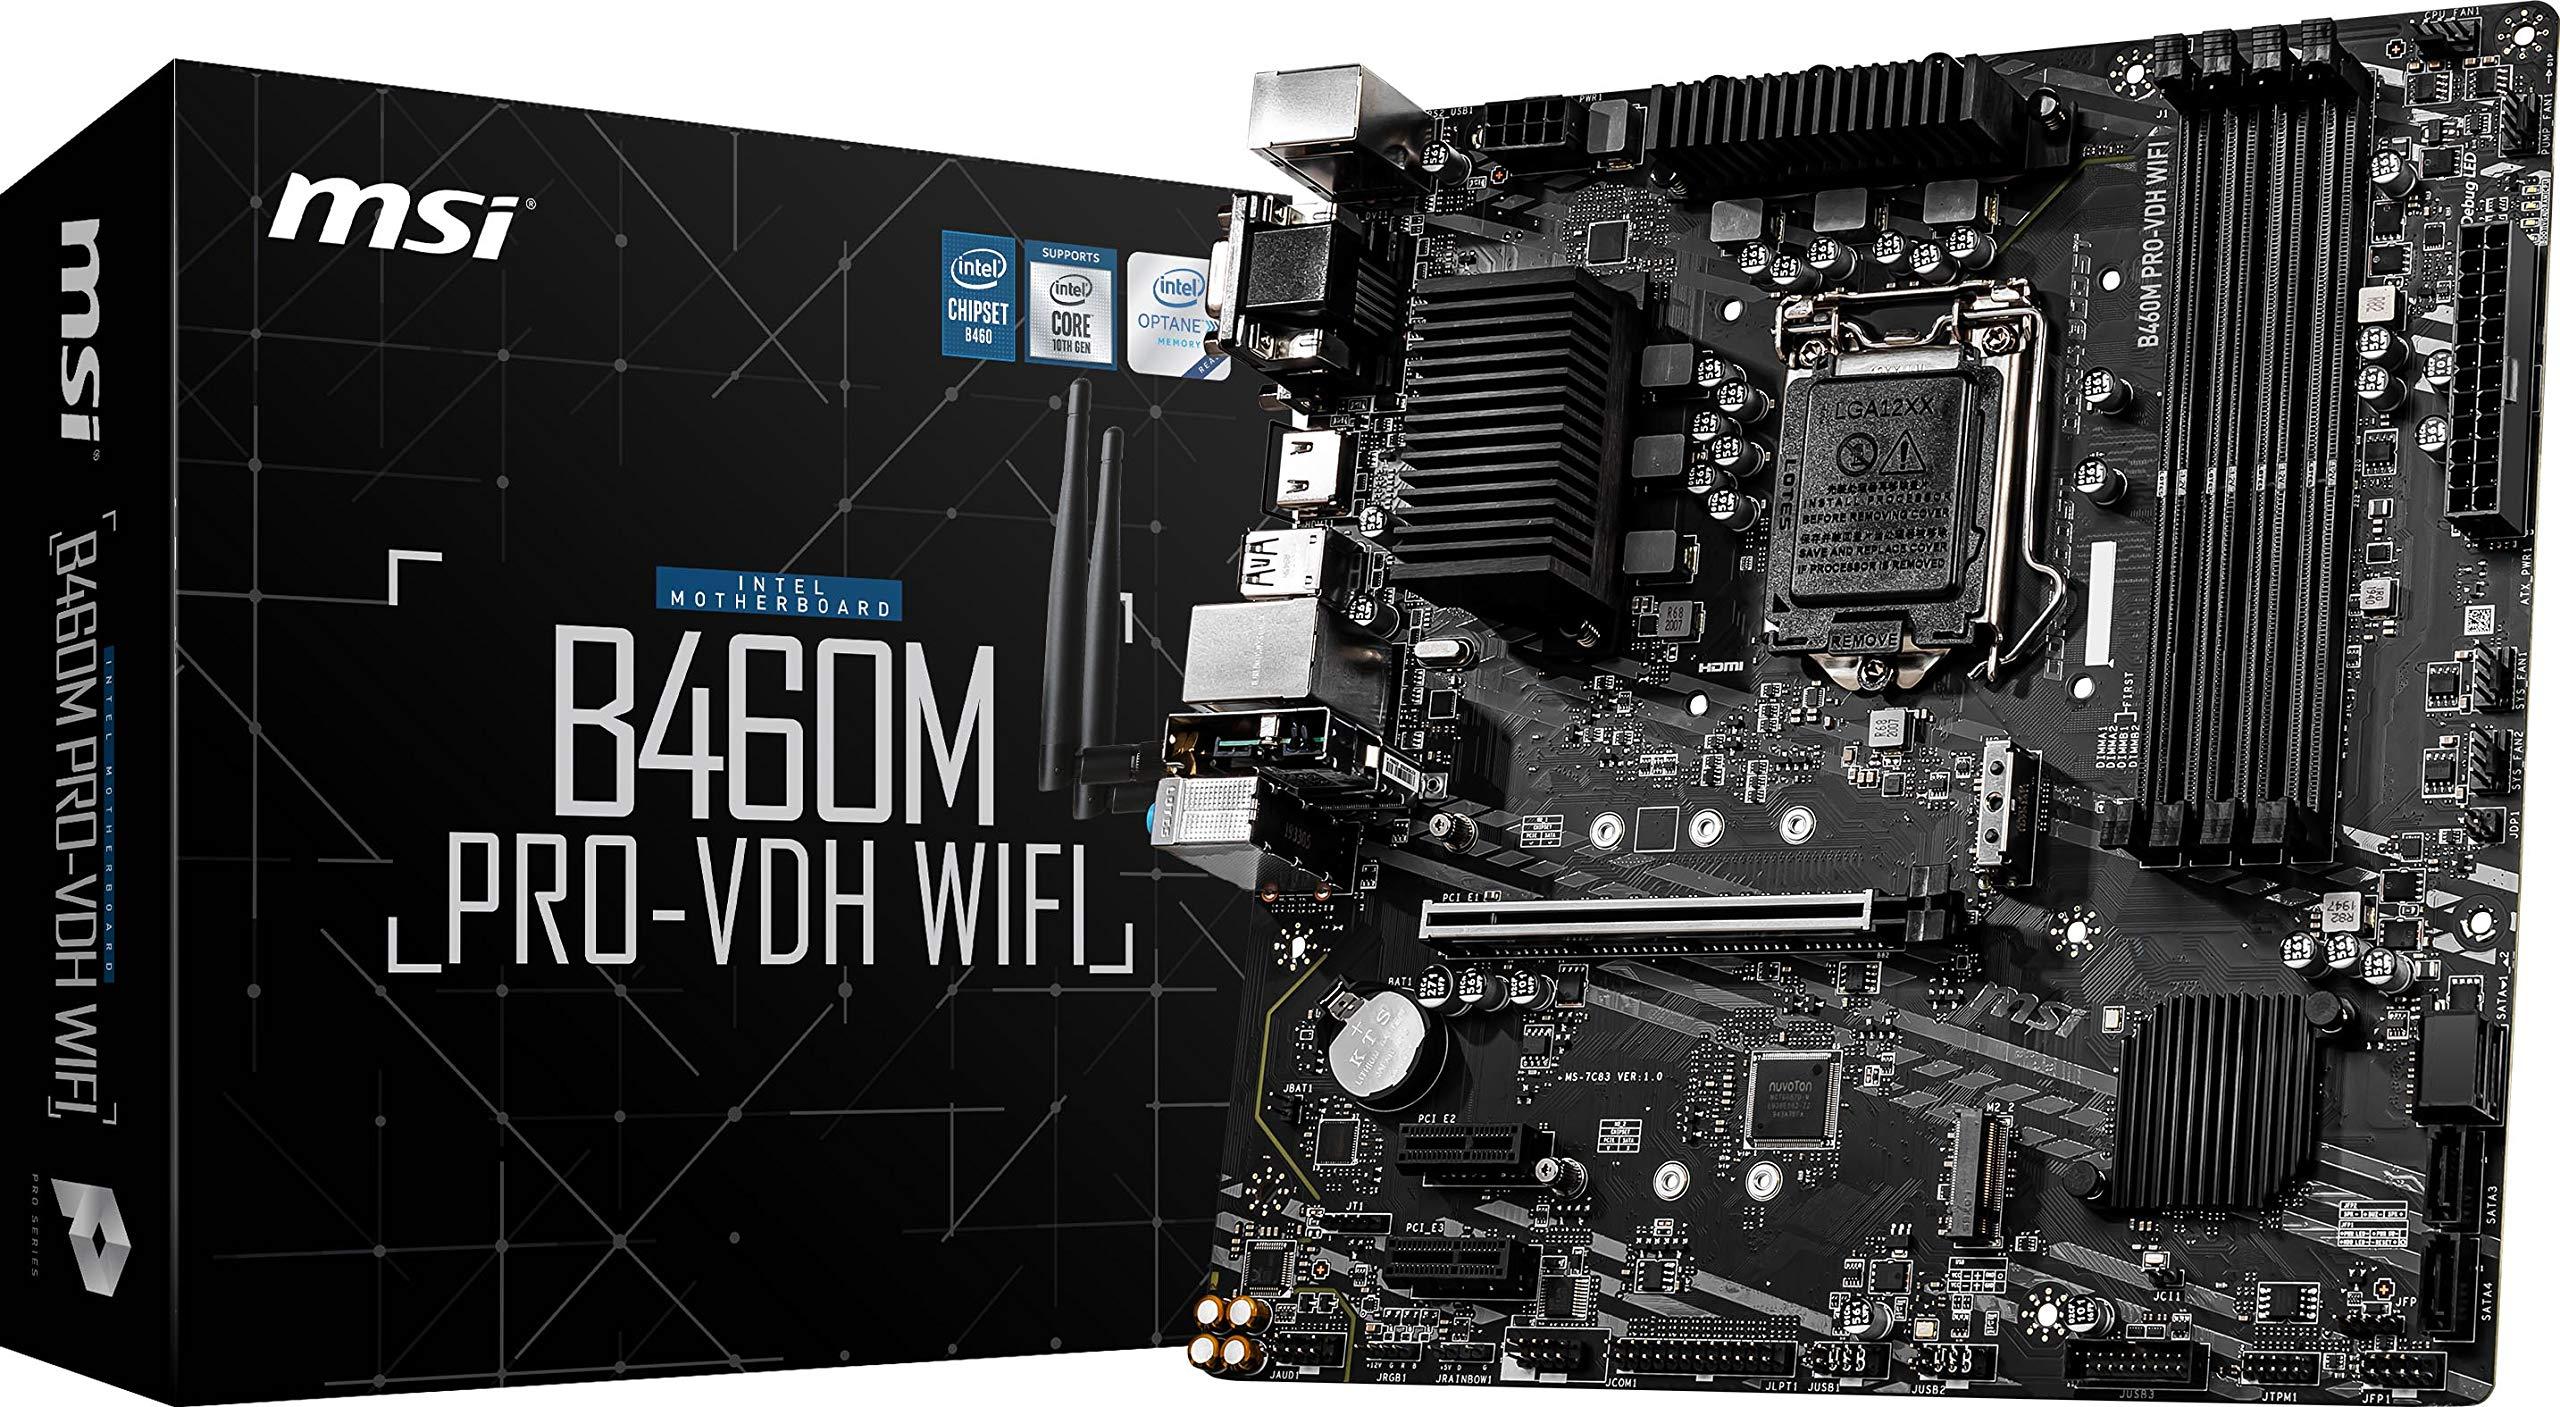 MSI B460M PRO-VDH WiFi ProSeries Motherboard (mATX, 10th Gen